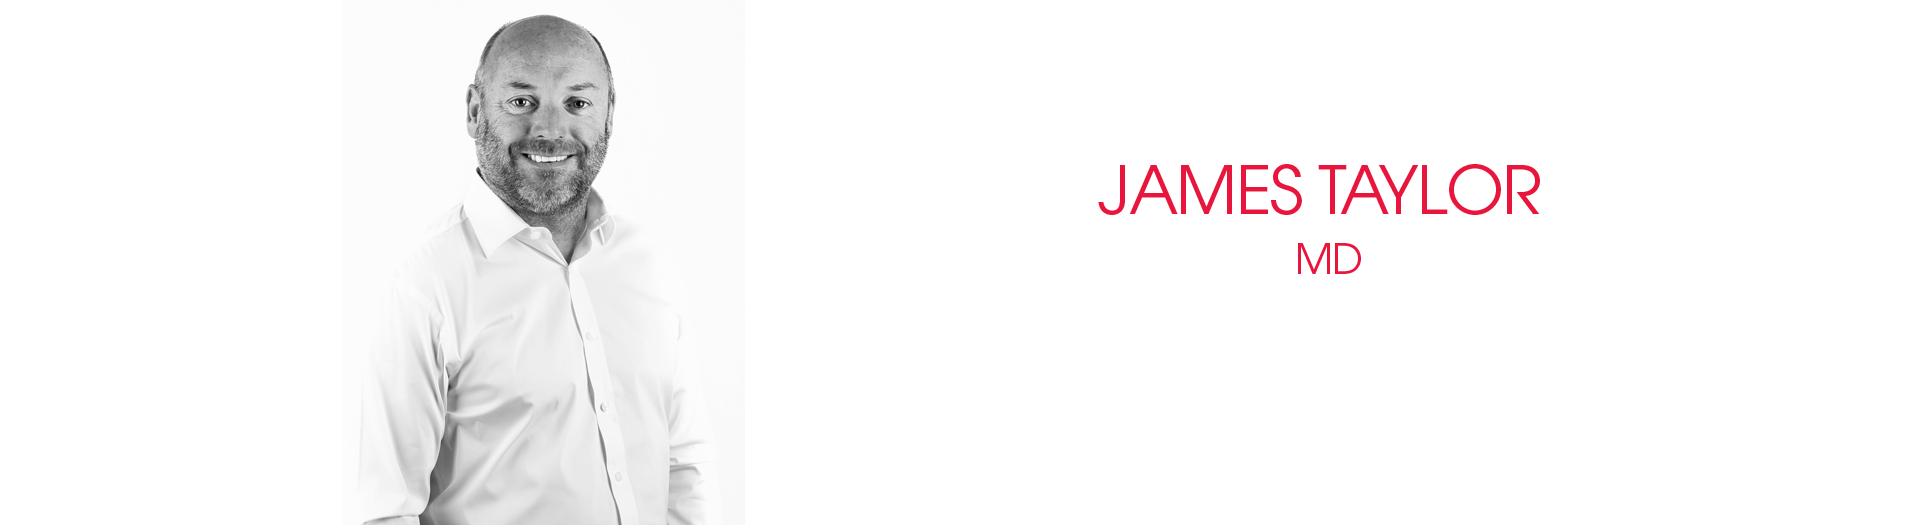 James Taylor MD